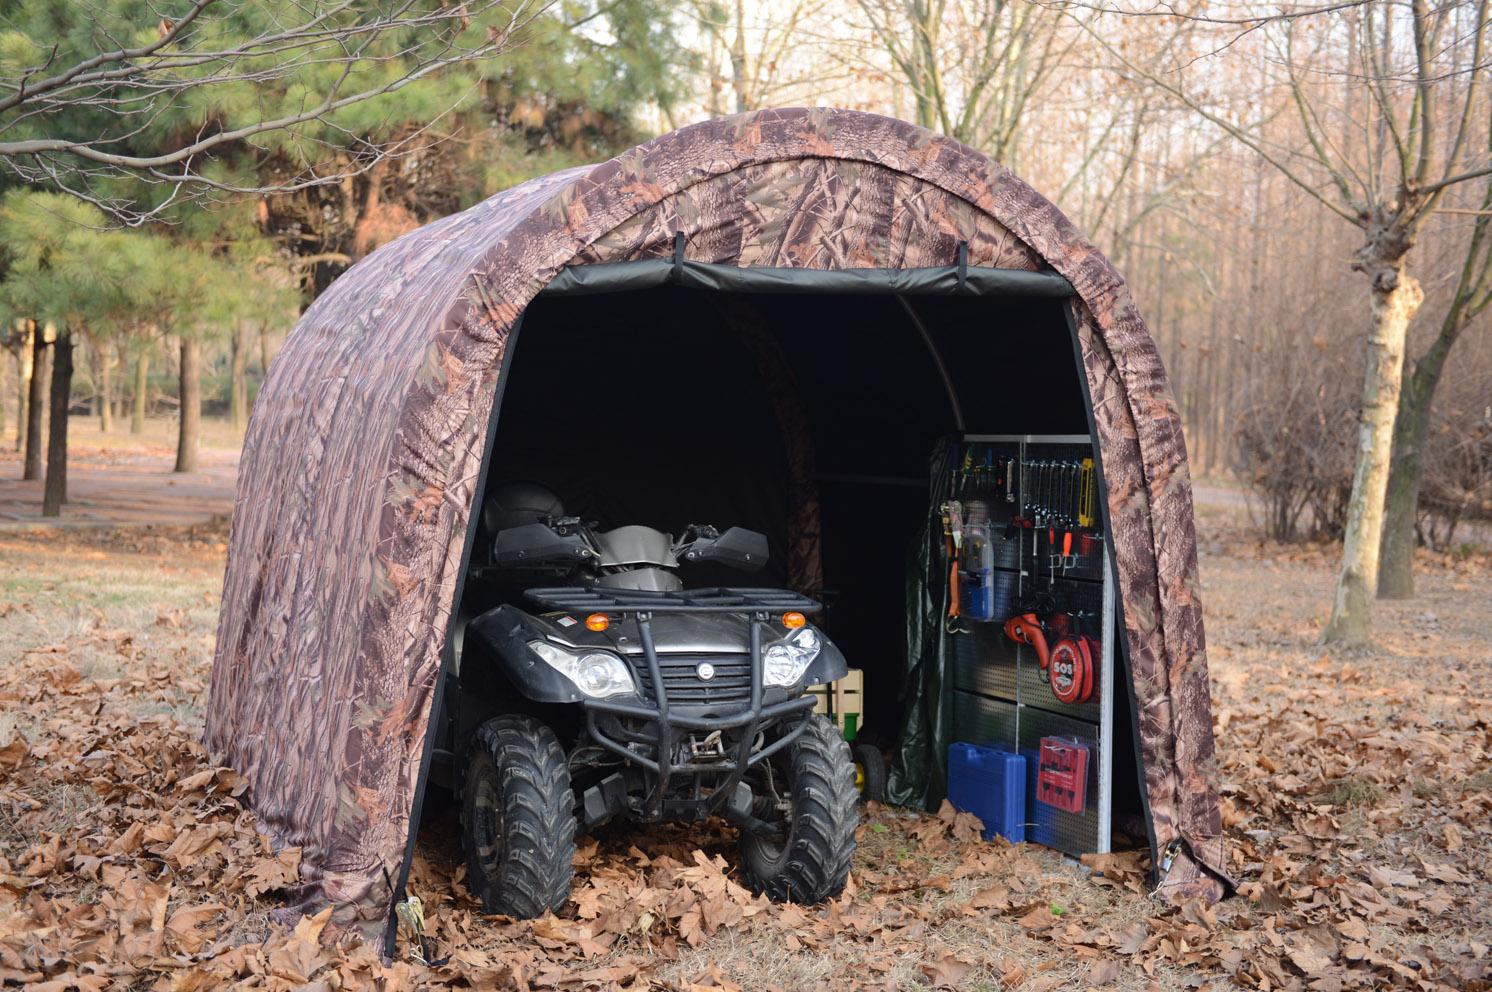 Camoflange ATV Shelter, Mini Portable Garage, 6 Leg Steel Frame 10 x10 x8-Feet